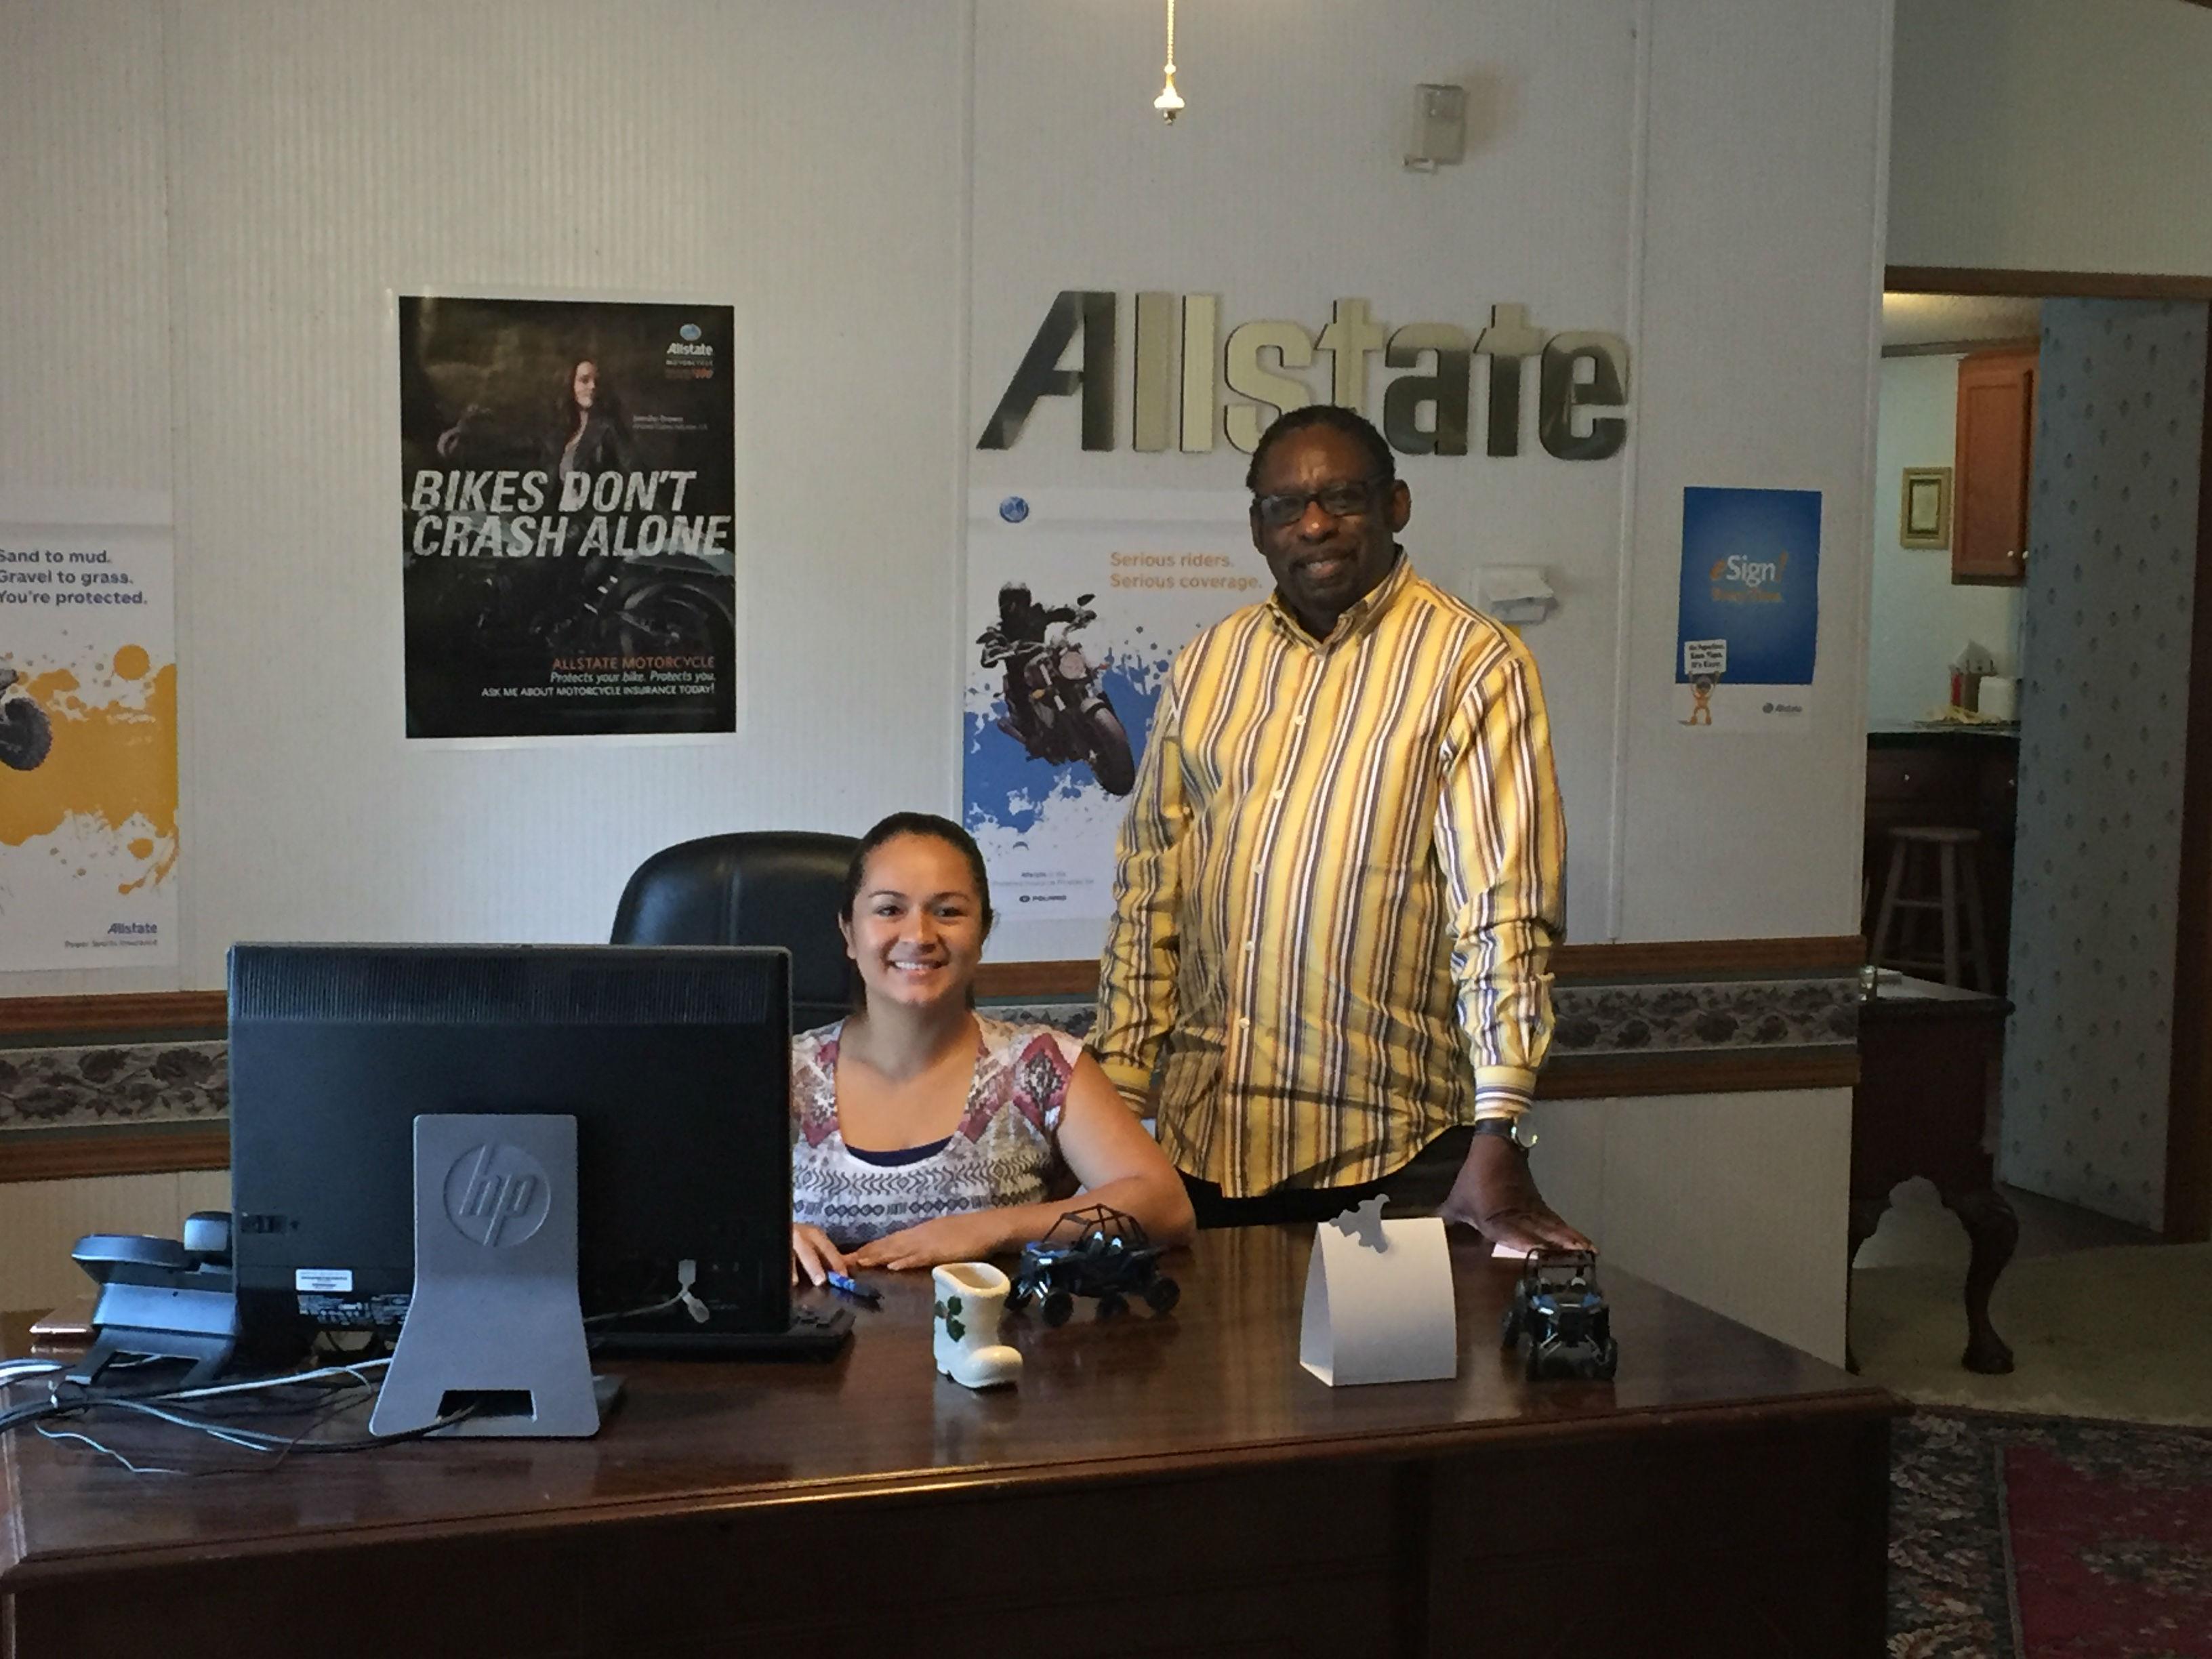 Damon Mitchell: Allstate Insurance image 2